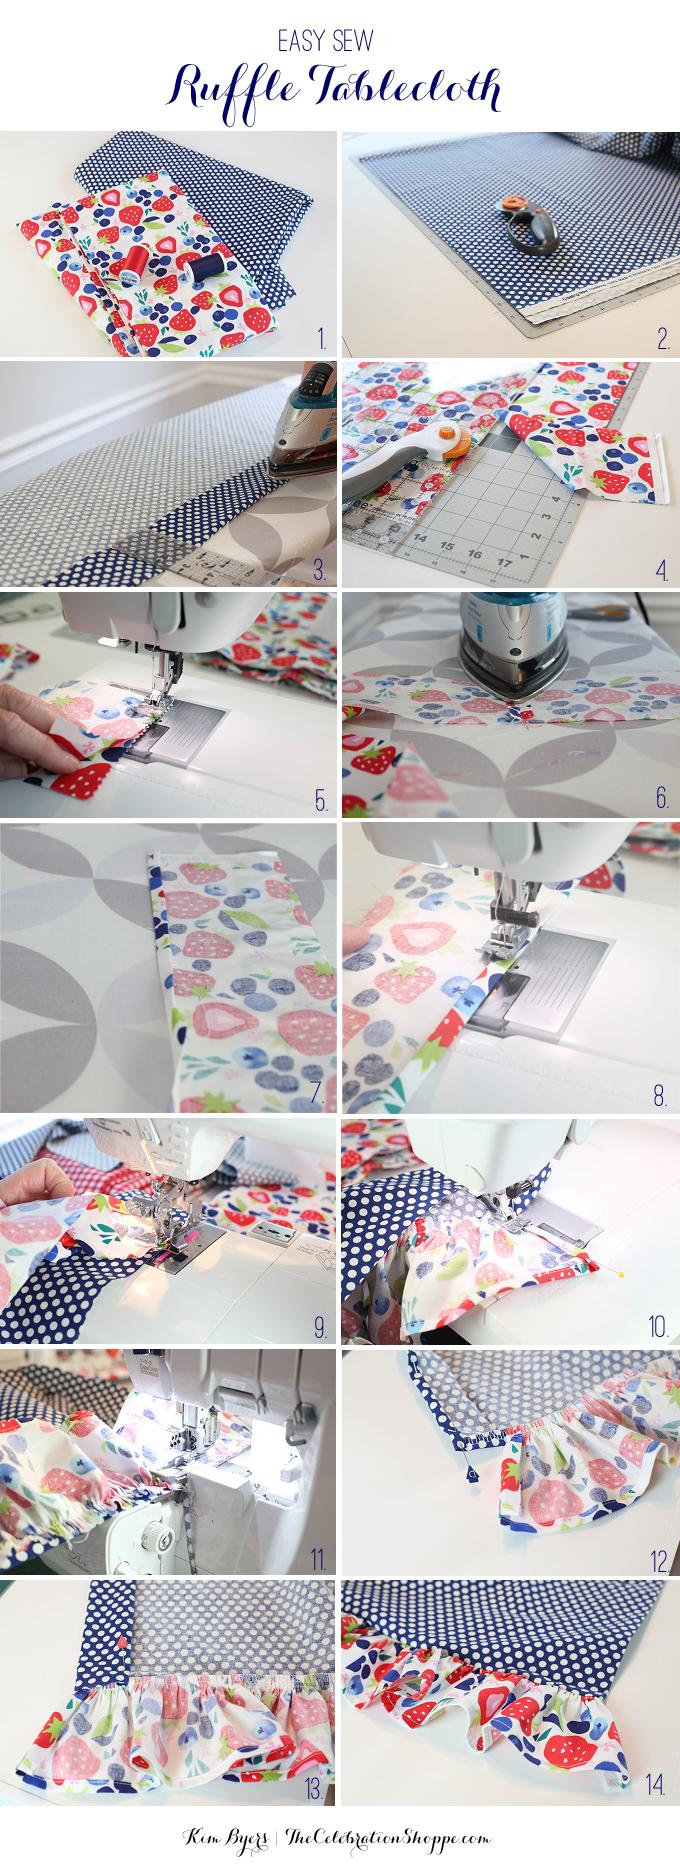 bbq tablecloth